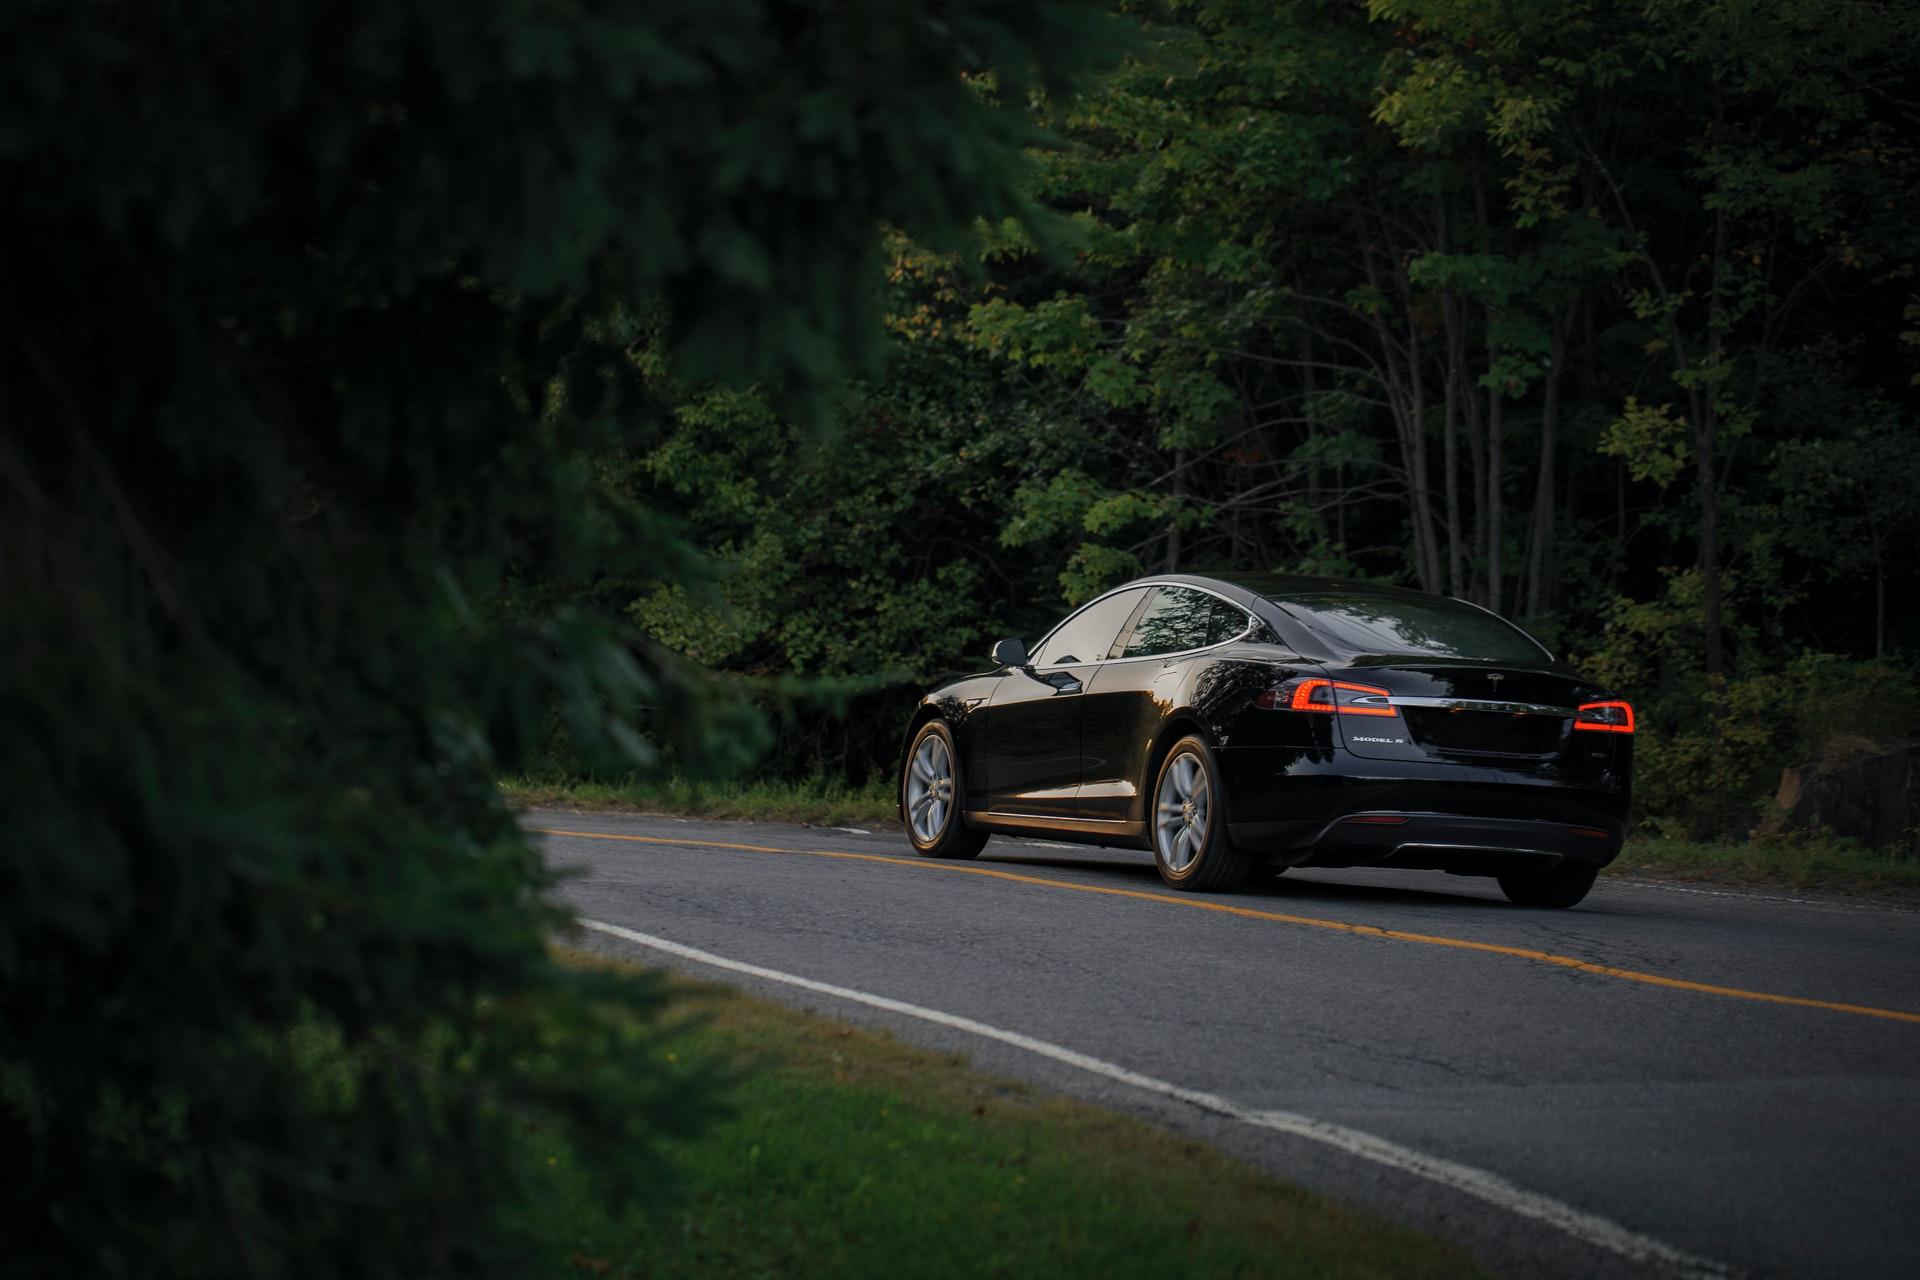 How do EV batteries impact the environment?